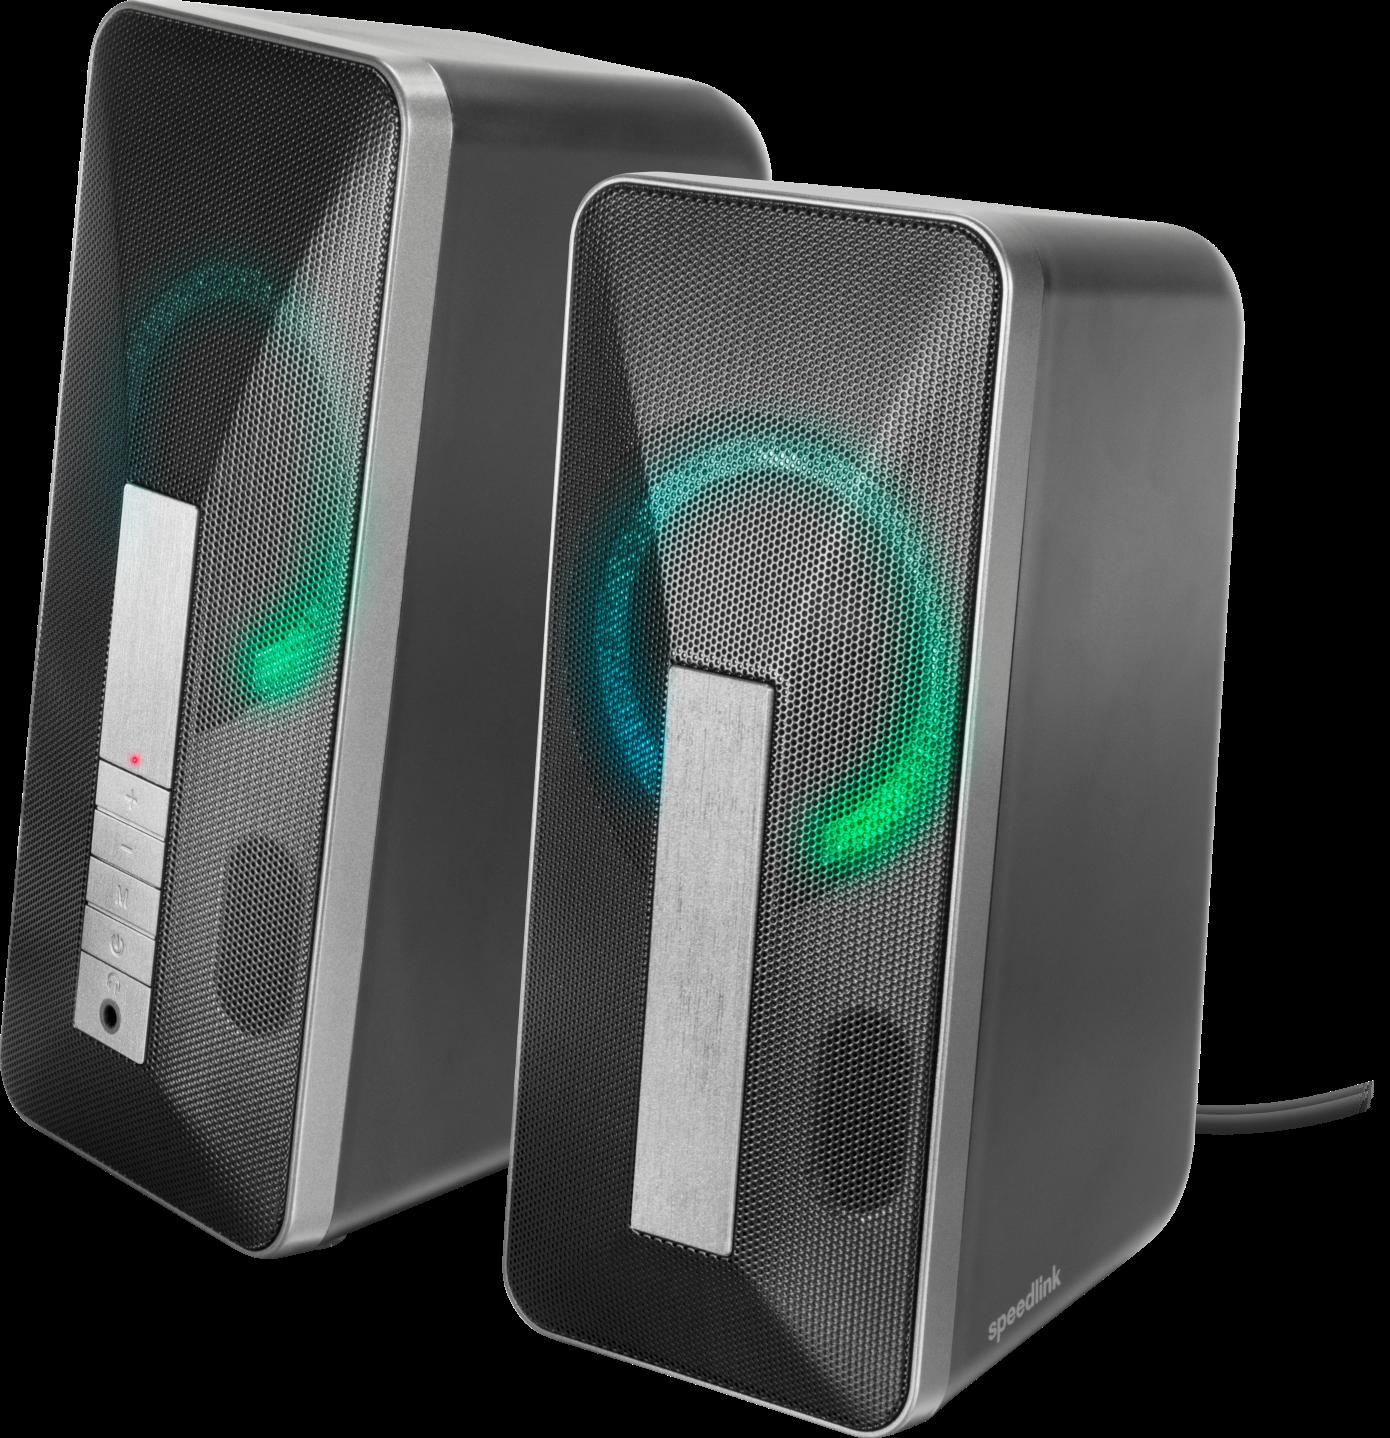 SL-810007-BK.Slot_2.png